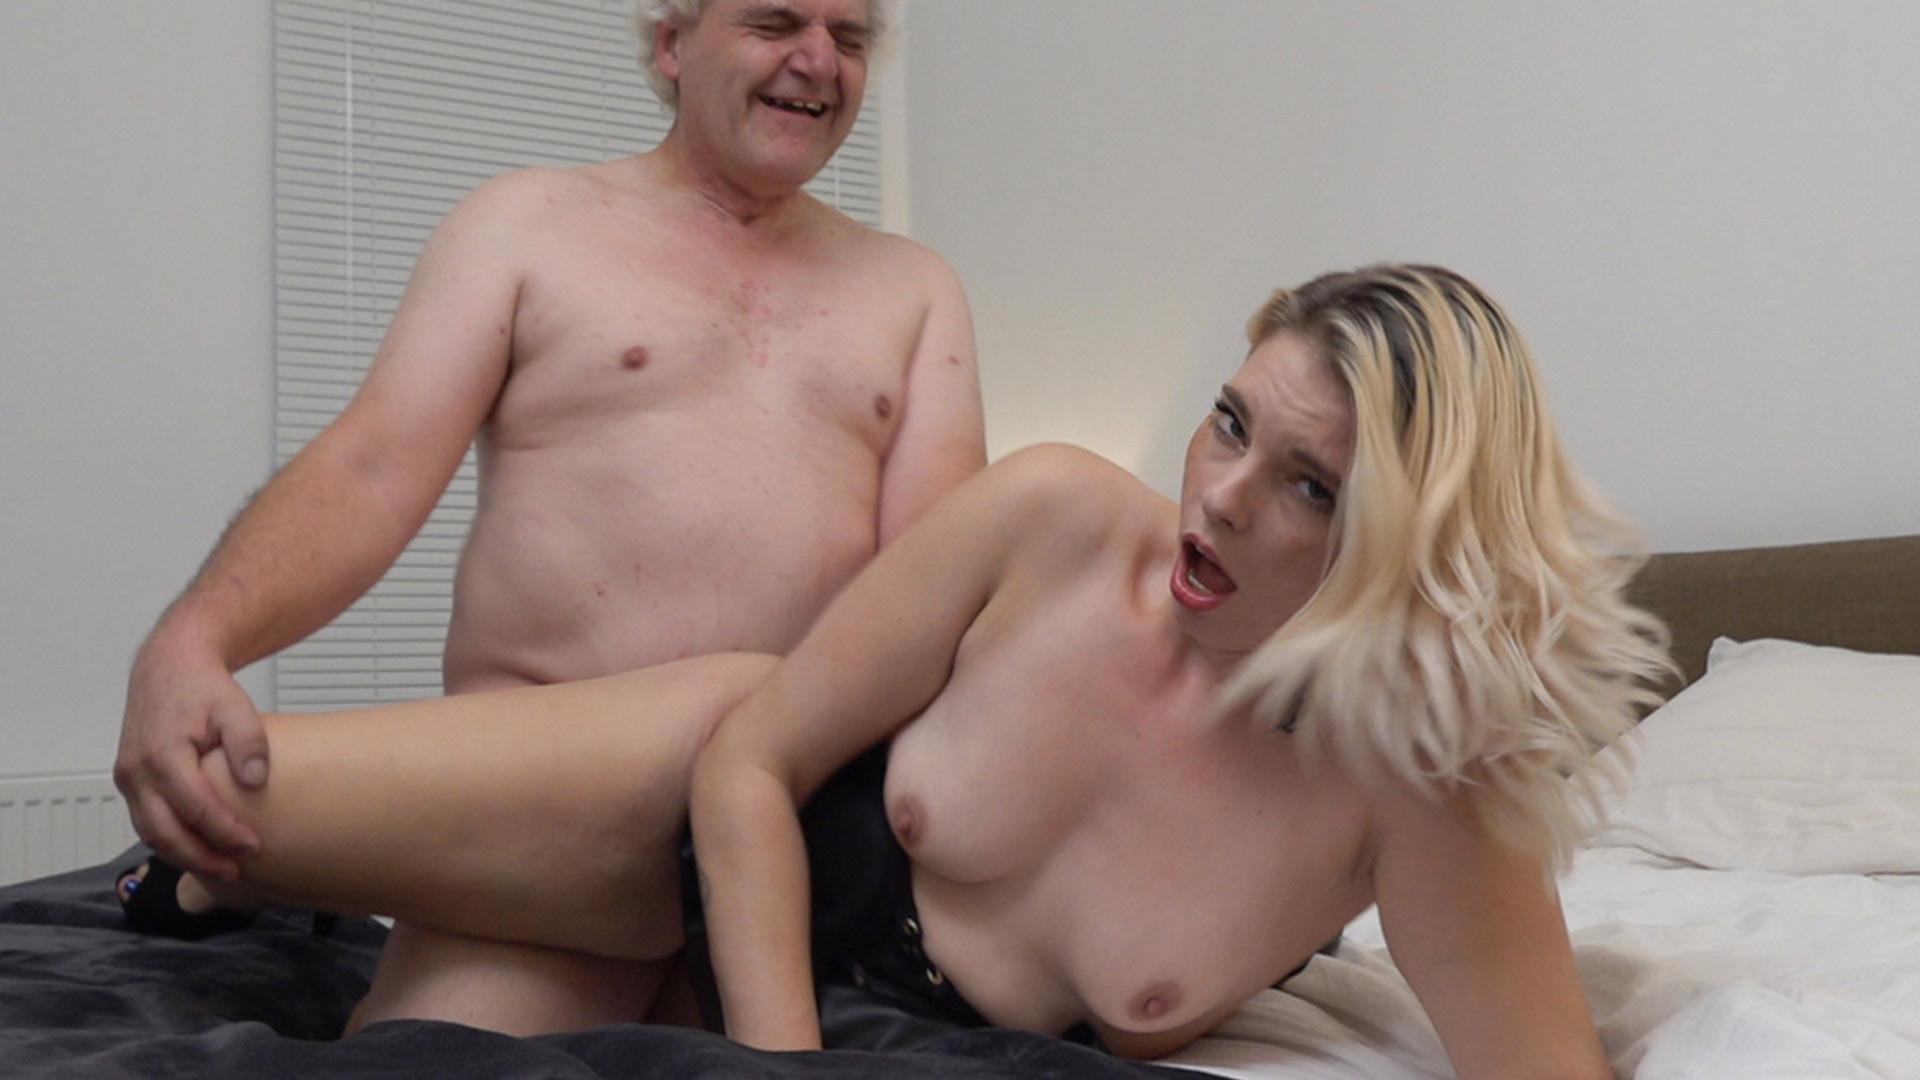 Chayenne neukt oude gluurman | Sexfilm